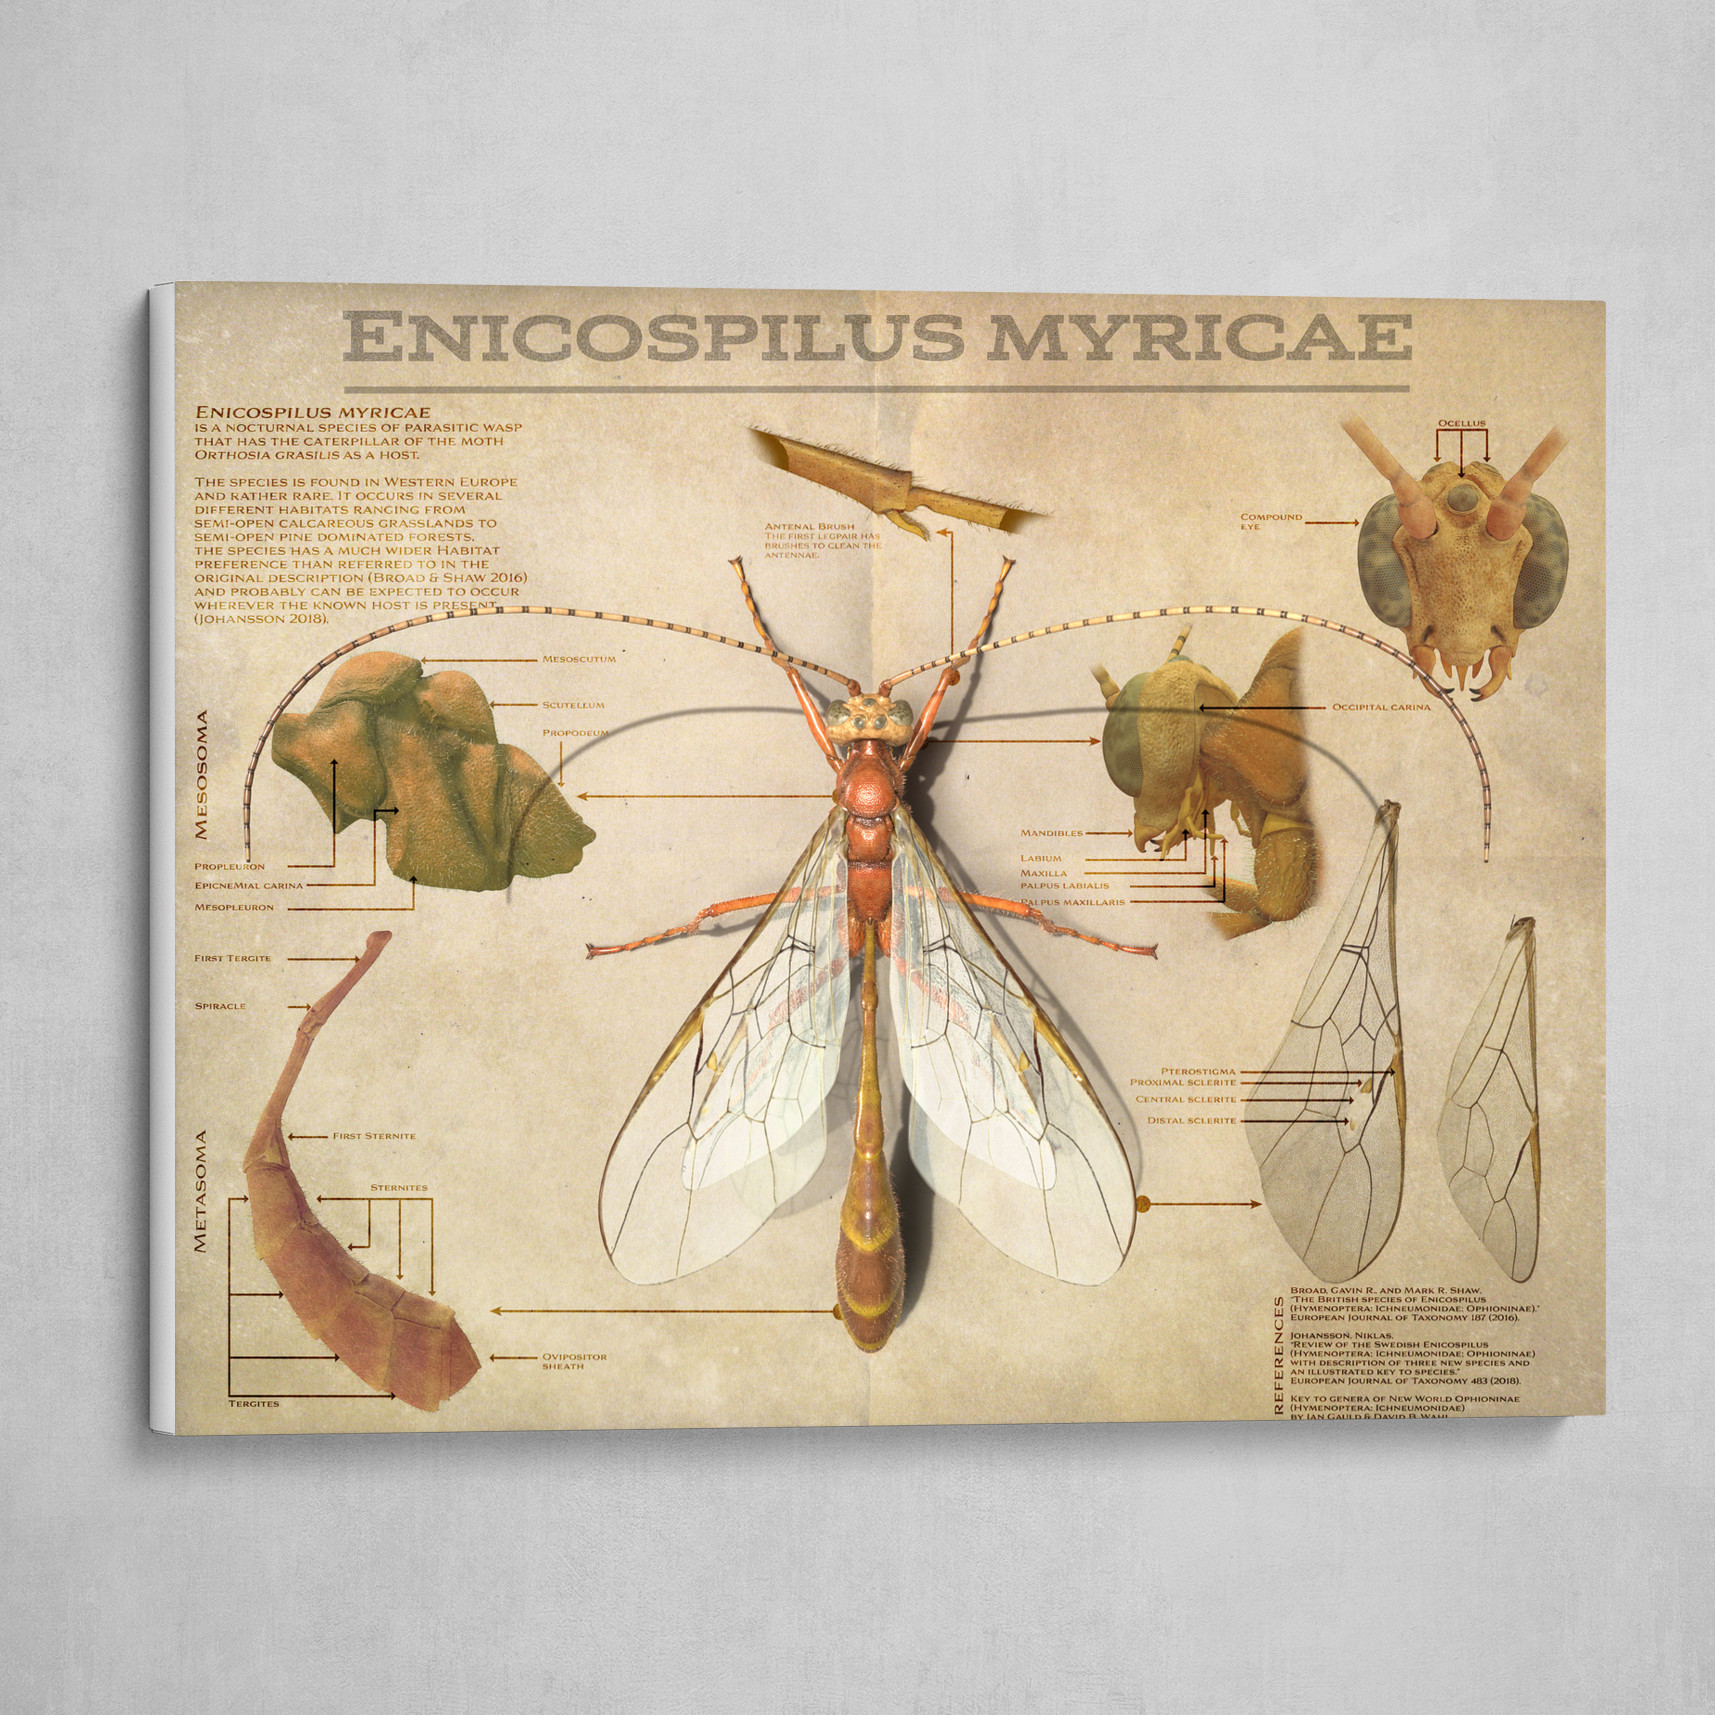 Enicospilus myricae. Old biology poster